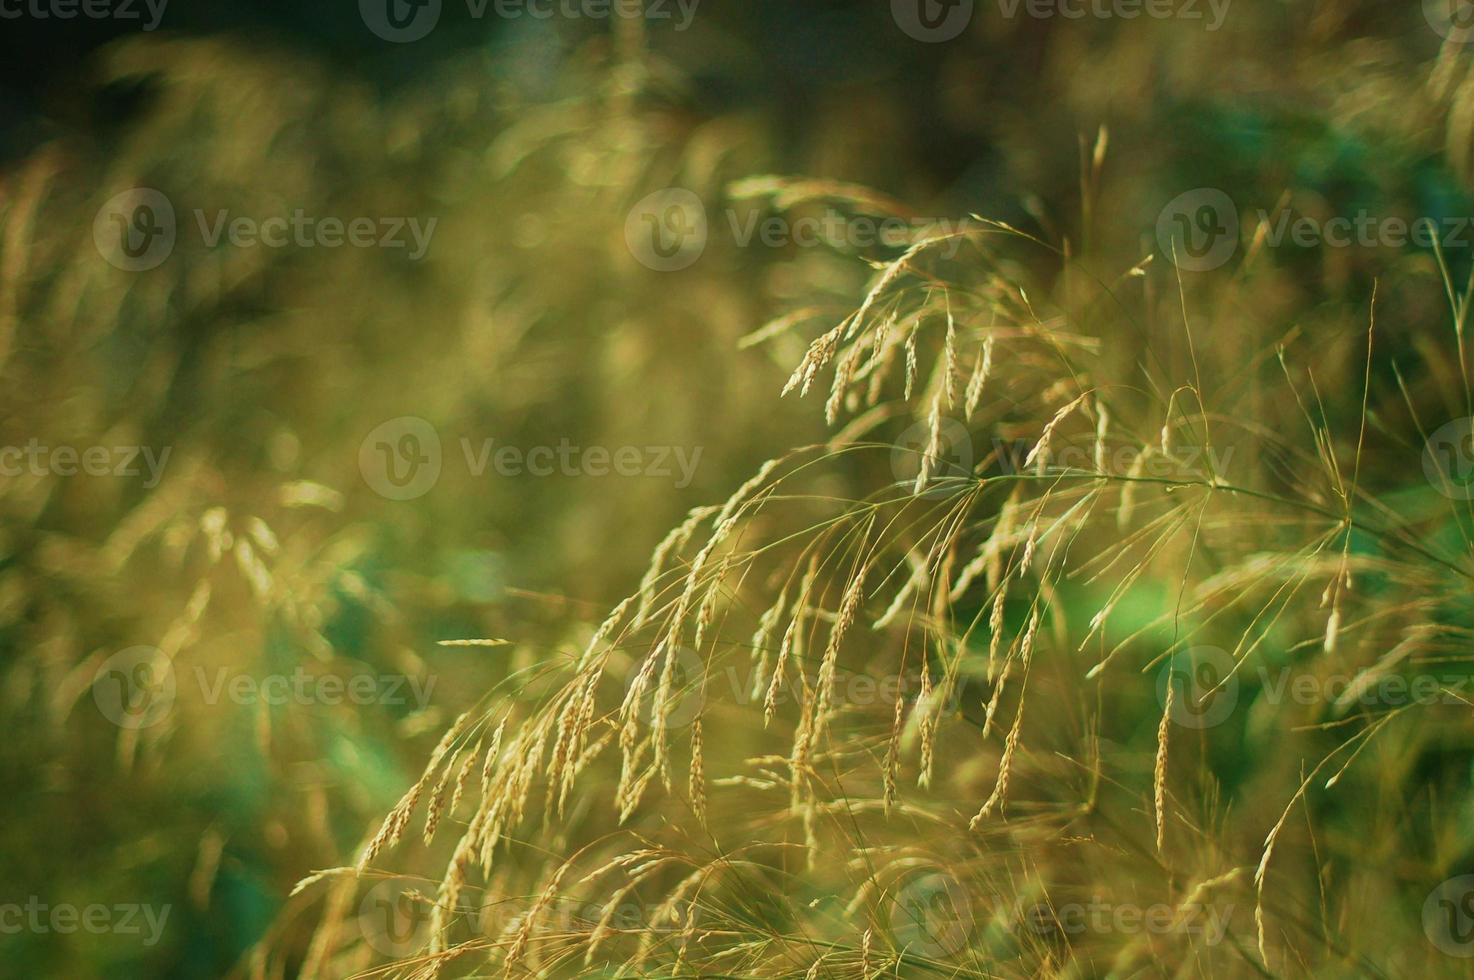 piante al vento foto